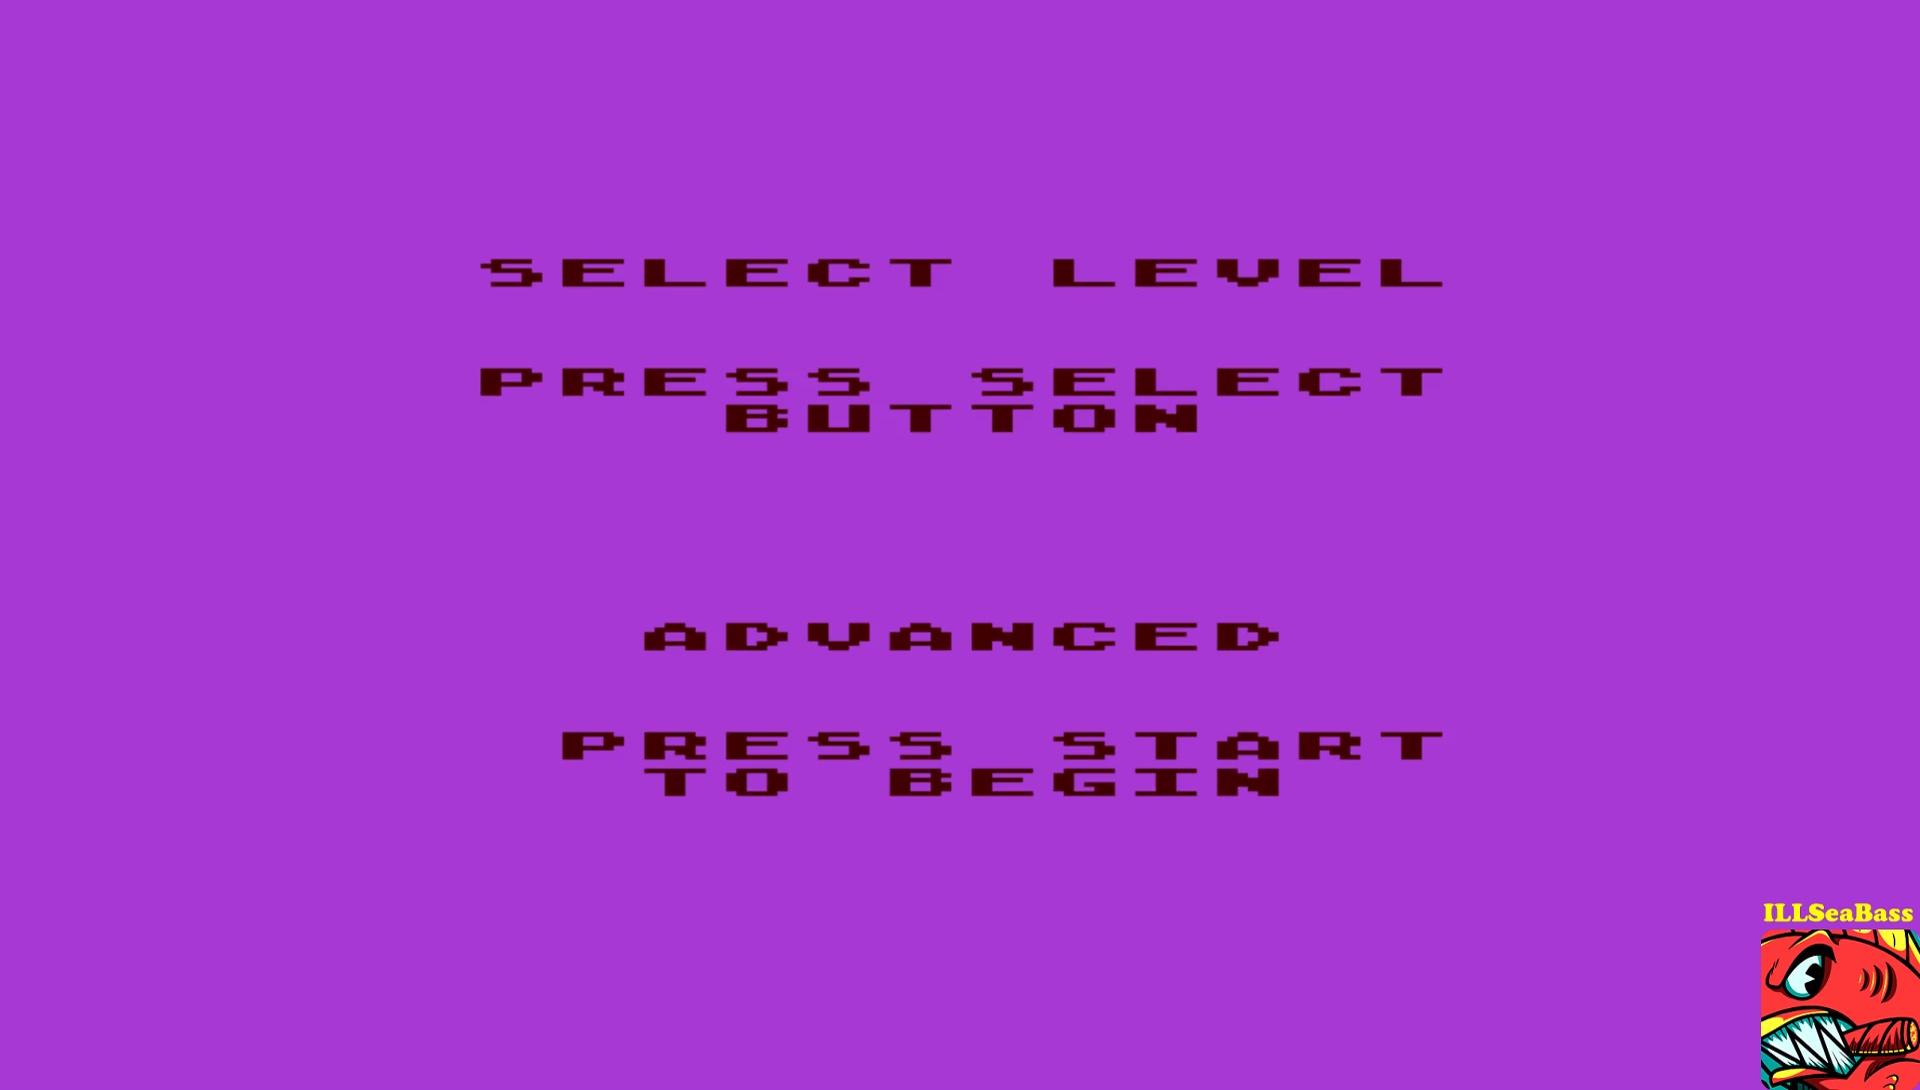 ILLSeaBass: Buffalo Stampede [Advanced] (Atari 400/800/XL/XE Emulated) 12,075 points on 2017-03-21 20:04:45